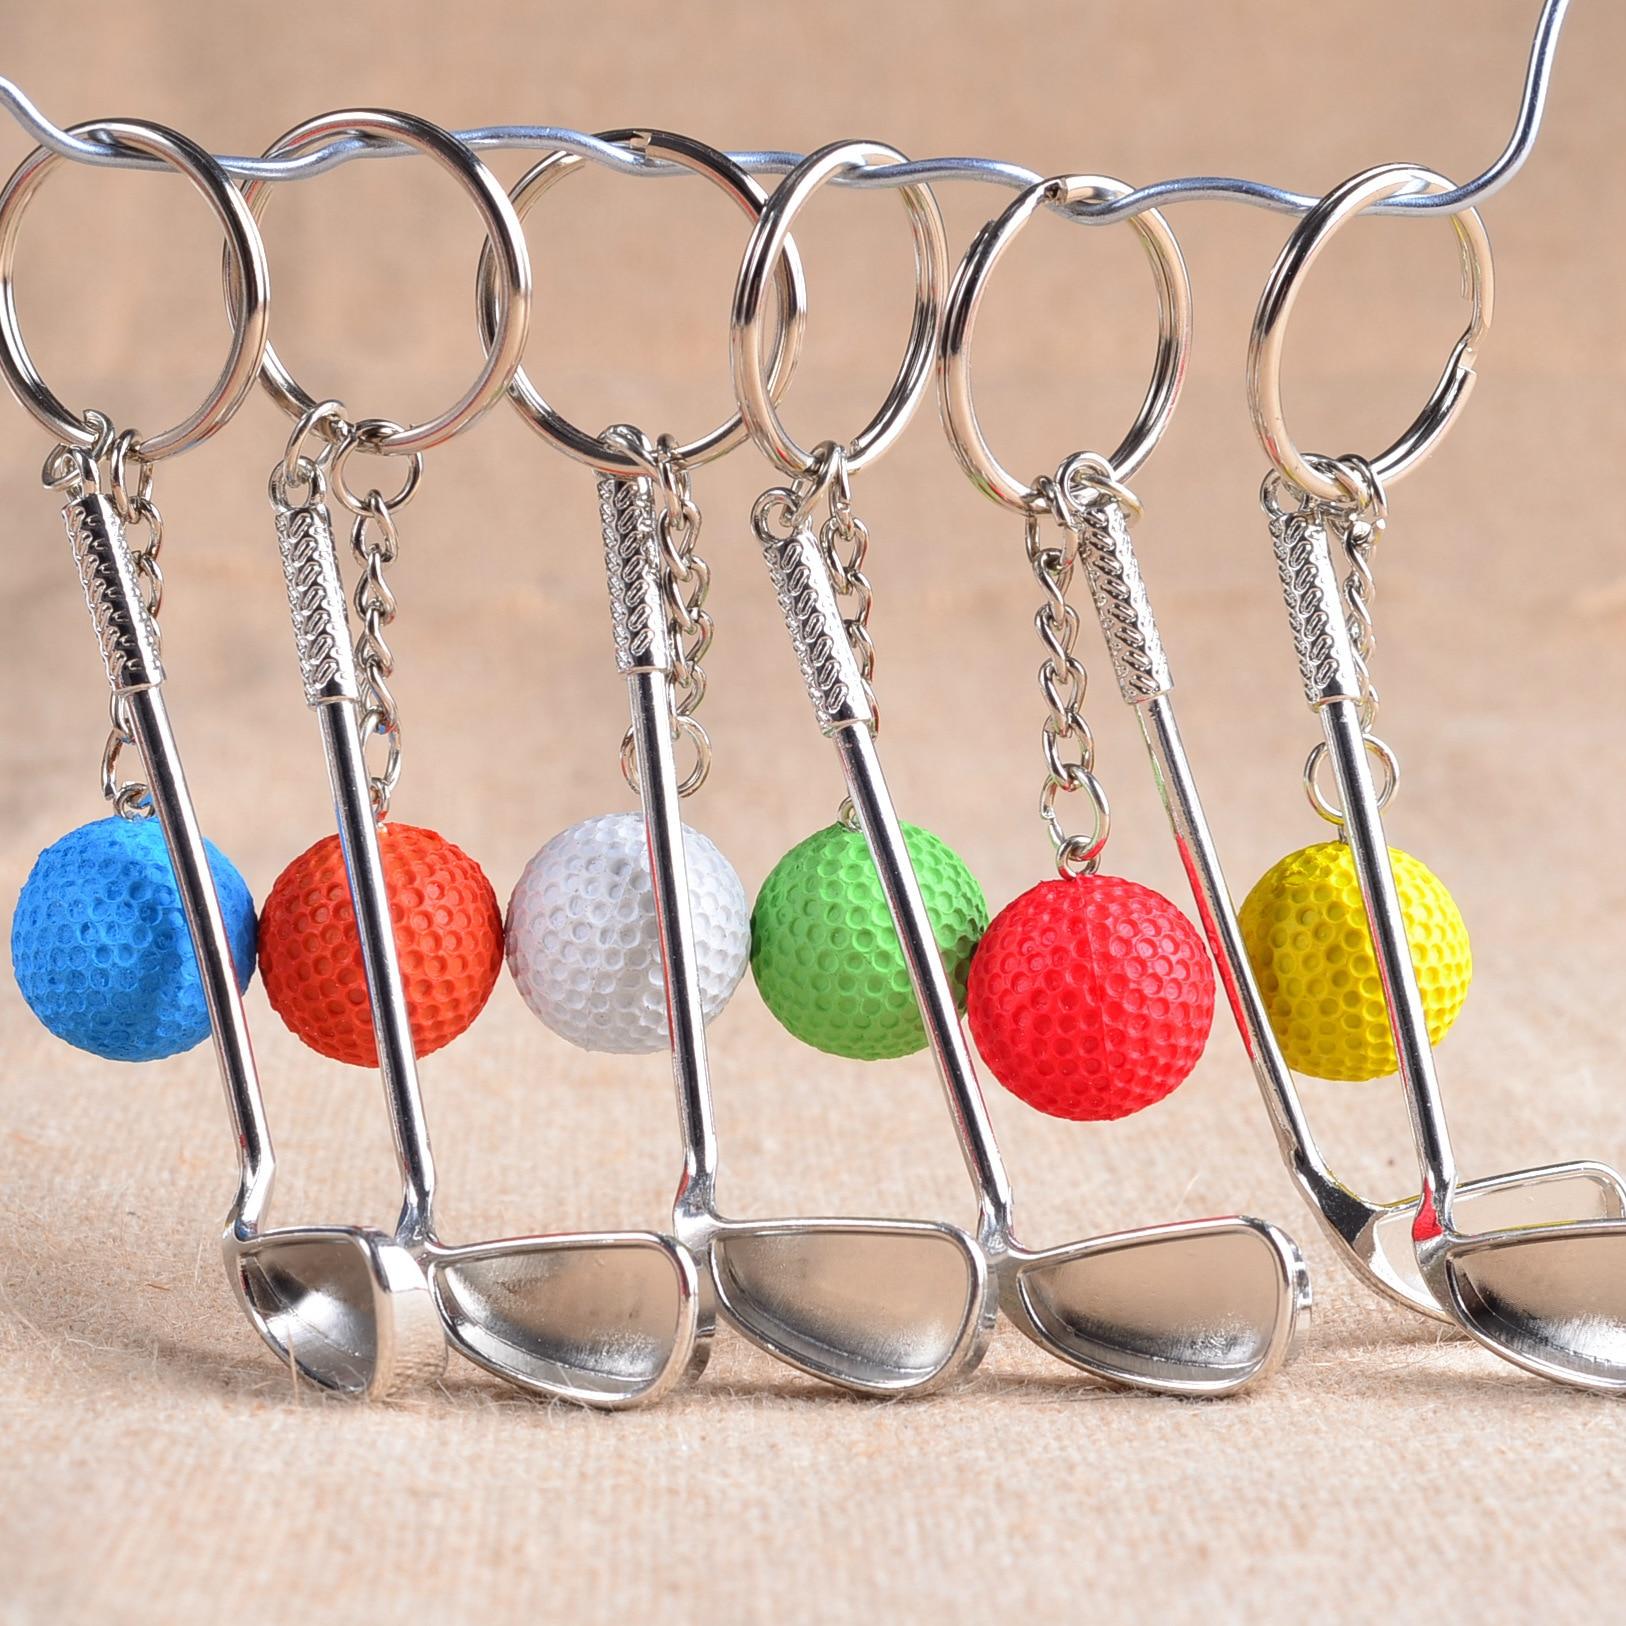 Wholesale 100Pcs/Lots Metal Golf Key Buckle High Grade Sporting Goods Sports Souvenirs Ball Key Ring стоимость